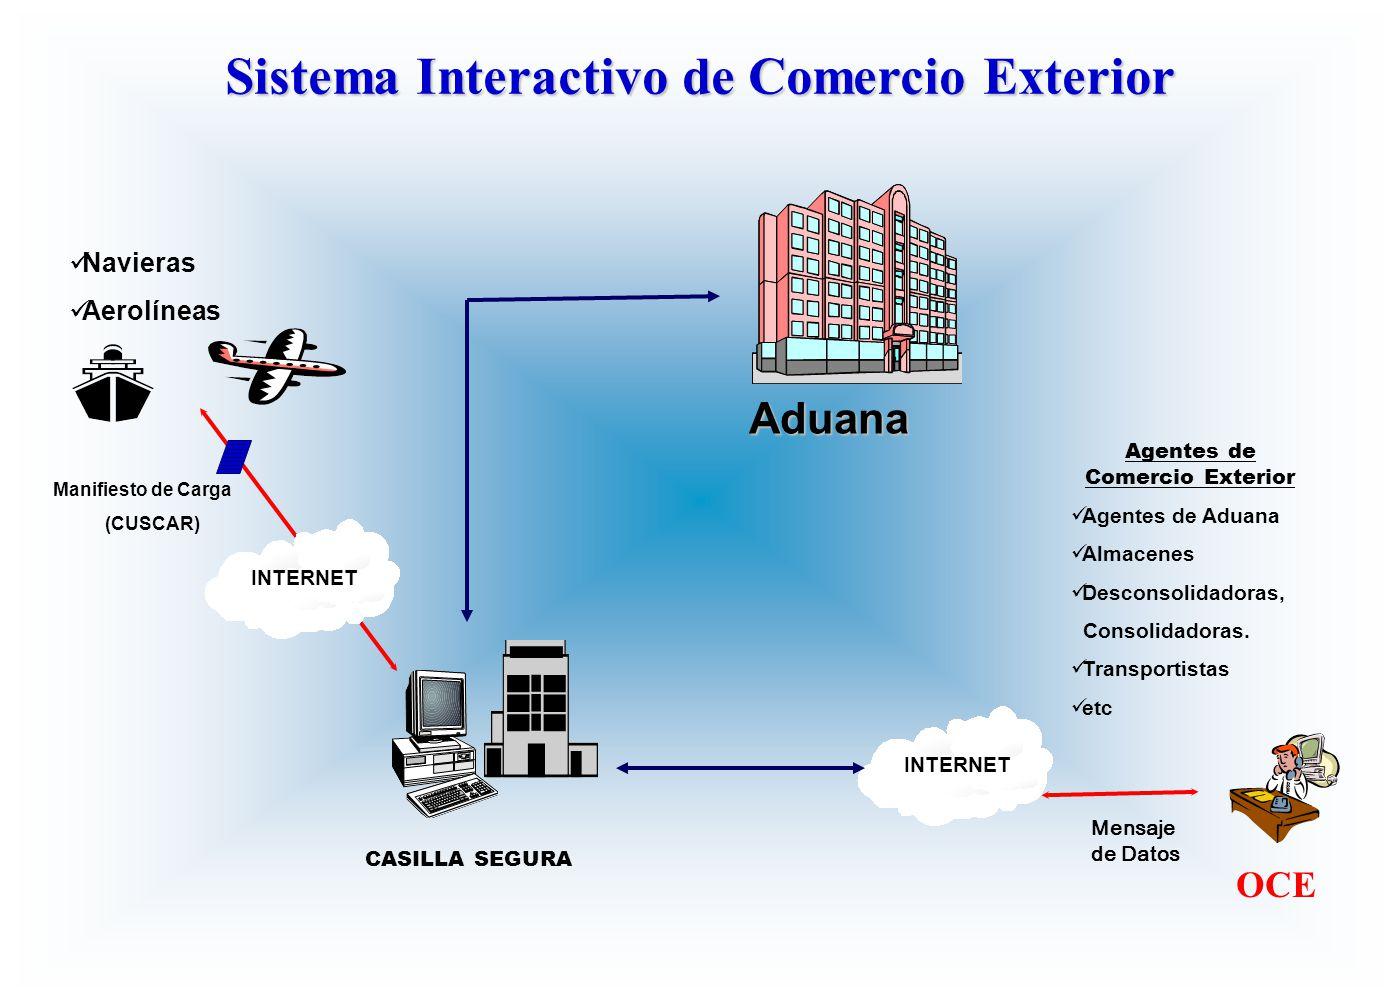 Manifiesto de Carga (CUSCAR) Aduana INTERNET Agentes de Comercio Exterior Agentes de Aduana Almacenes Desconsolidadoras, Consolidadoras. Transportista